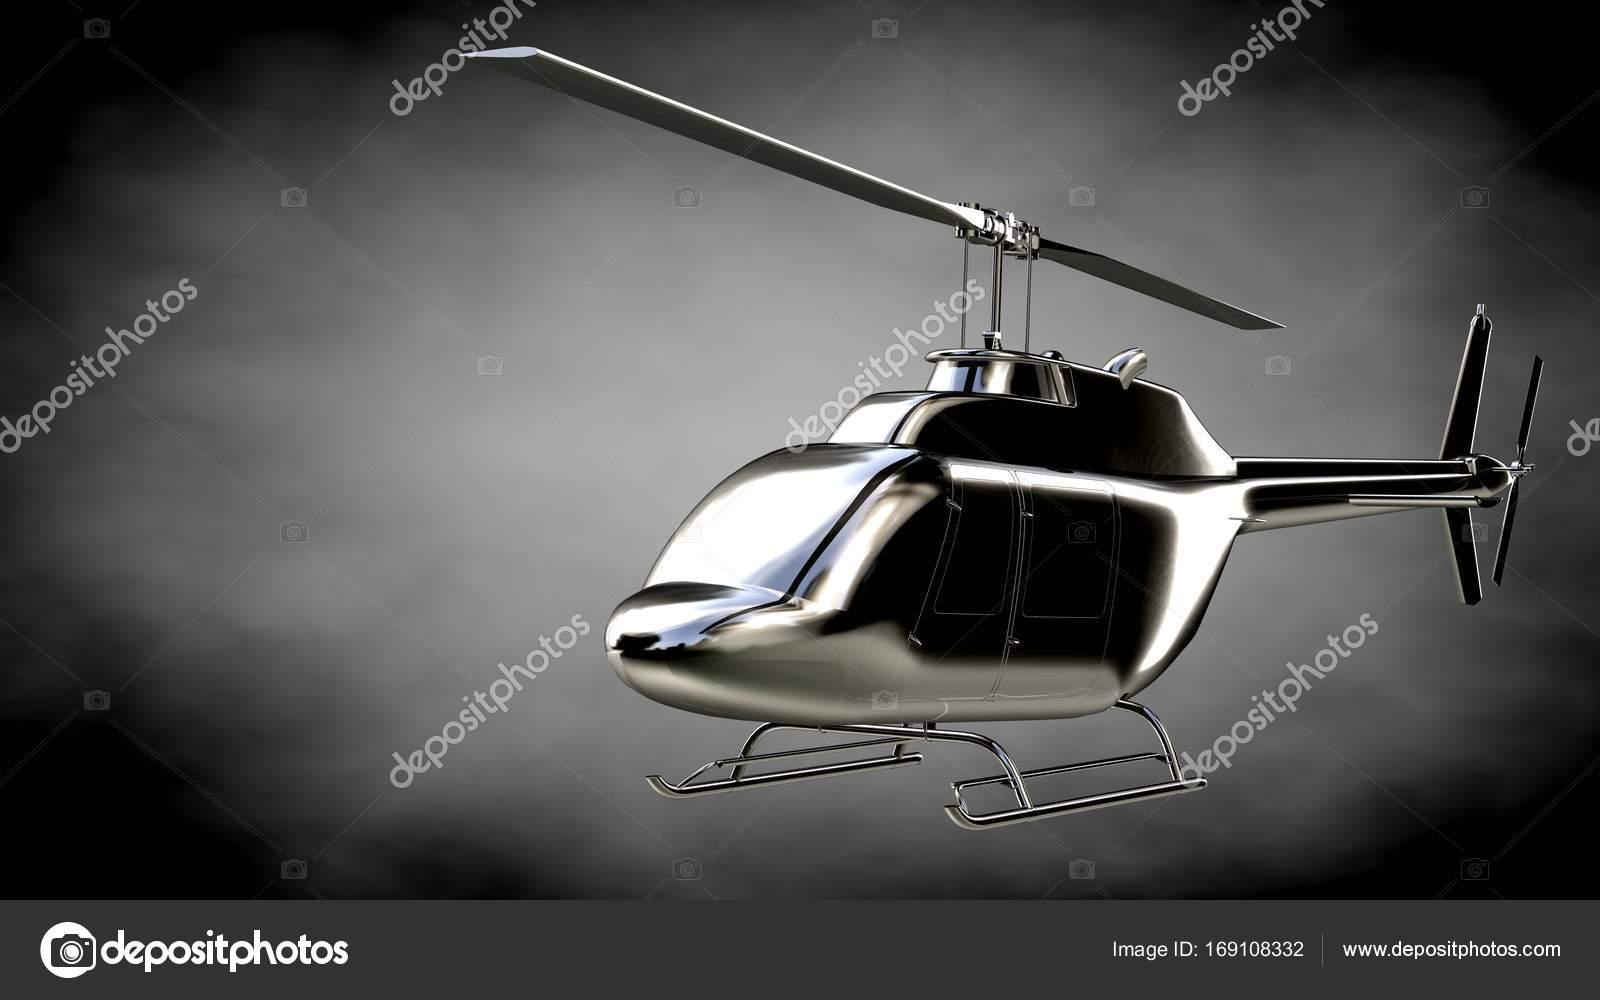 Elicottero 3d Model : Cyclingdad me syma rc quadcopter canali axis d rotolo a